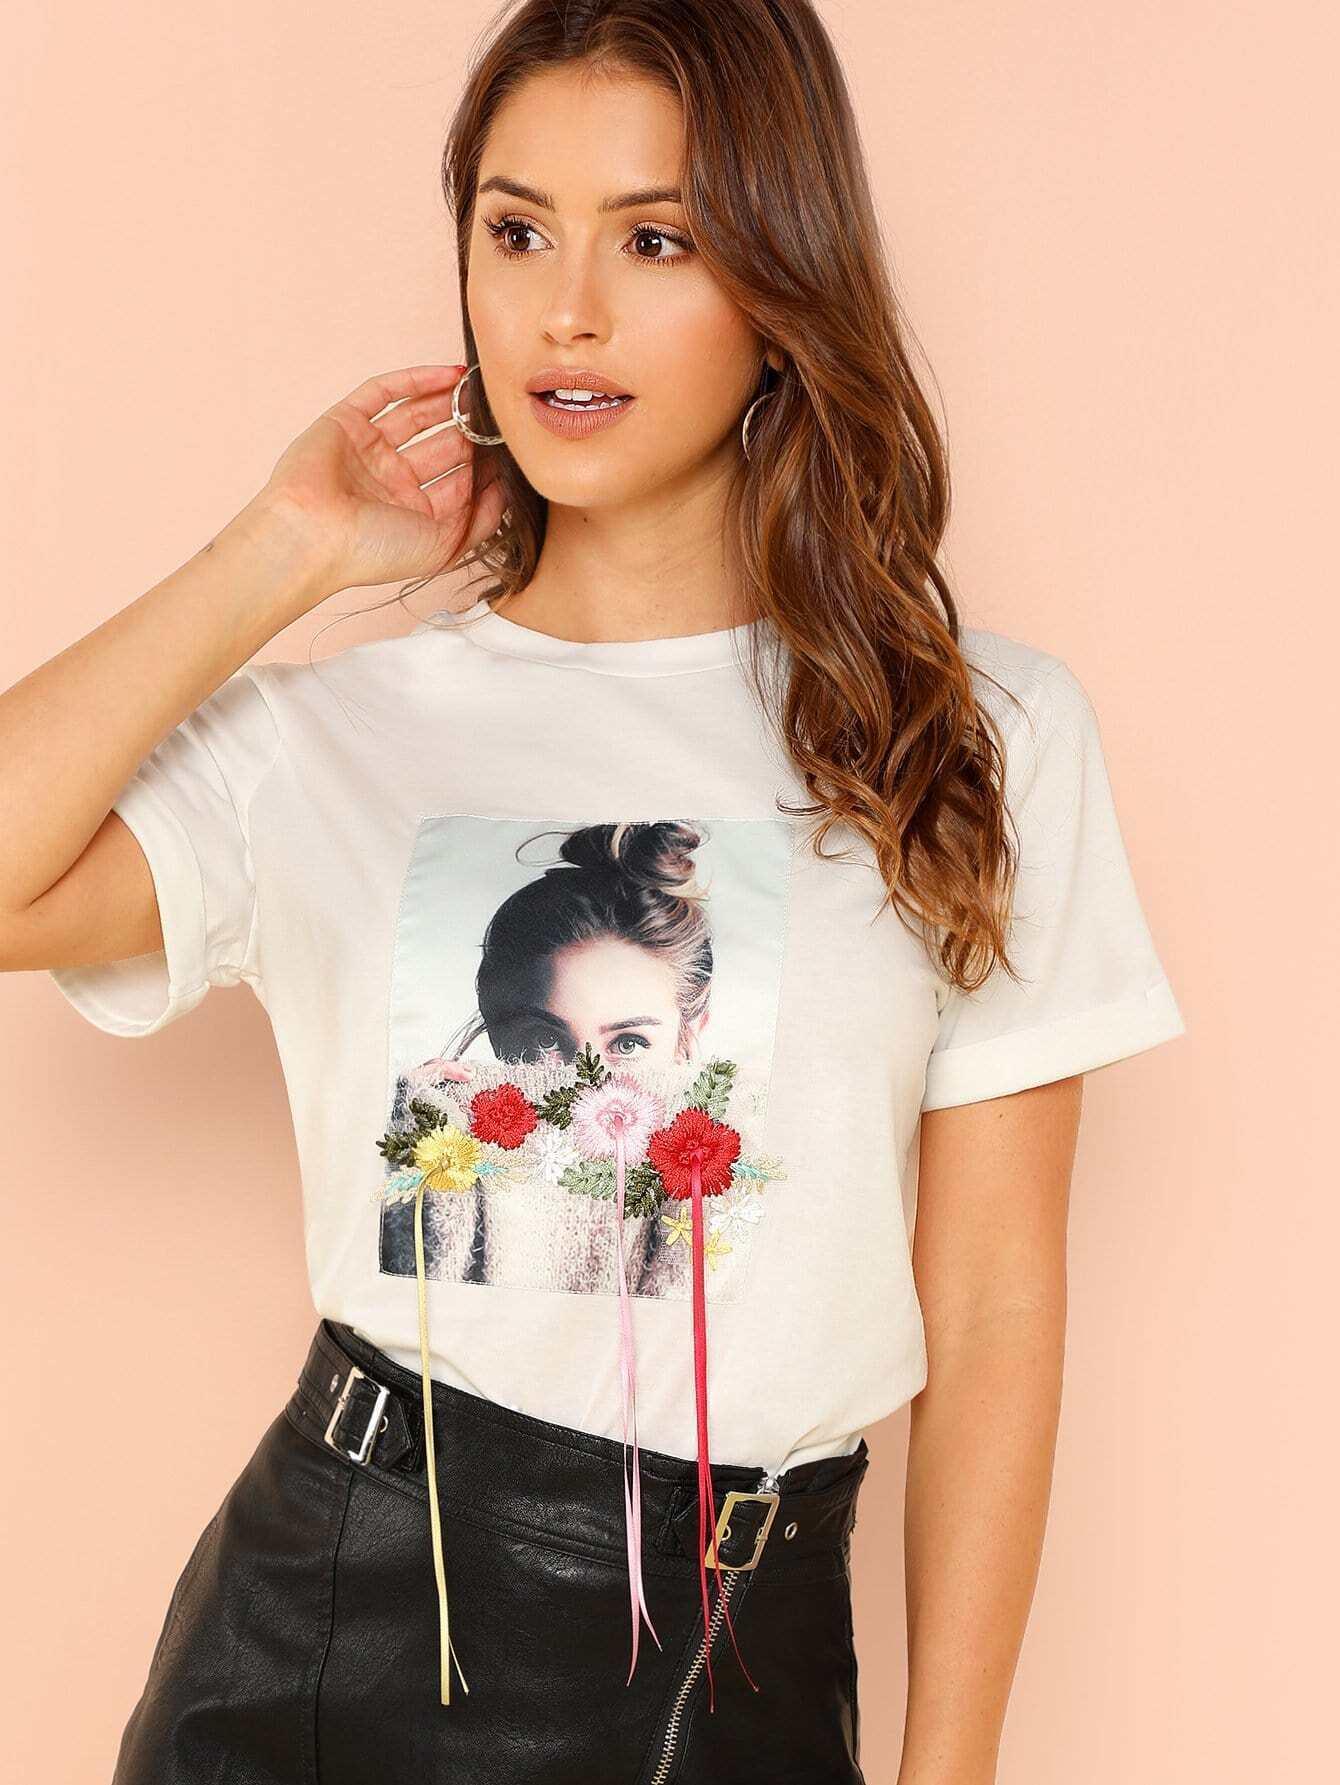 Flower Applique Figure Print T-shirt redfox футболка flower t 42 4300 желтый